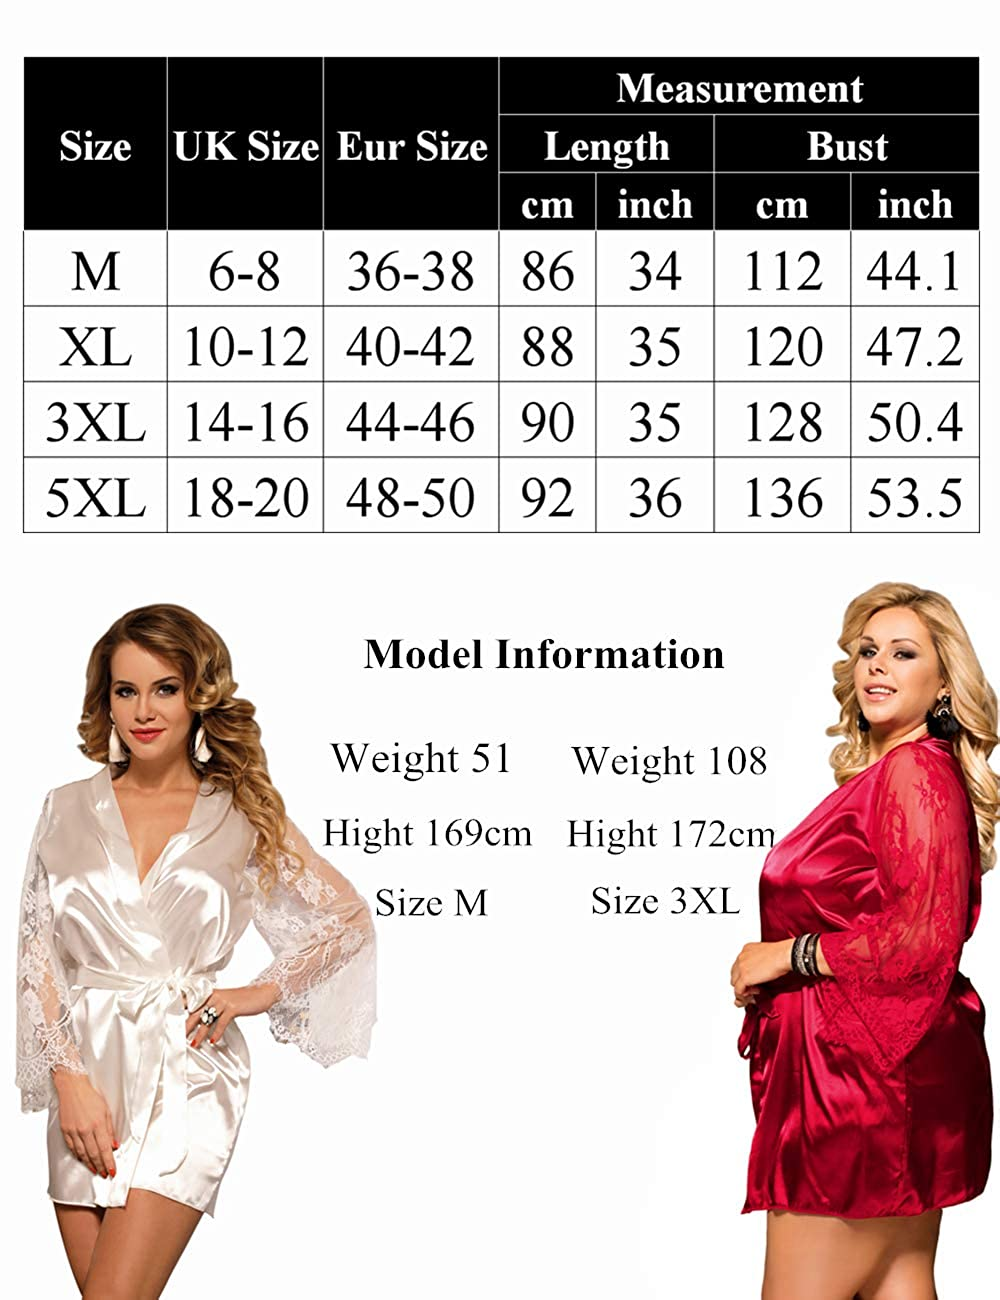 Damen Kimono Morgenmantel Bademantel Durchsichtig 34 36 38 40 42 44 46